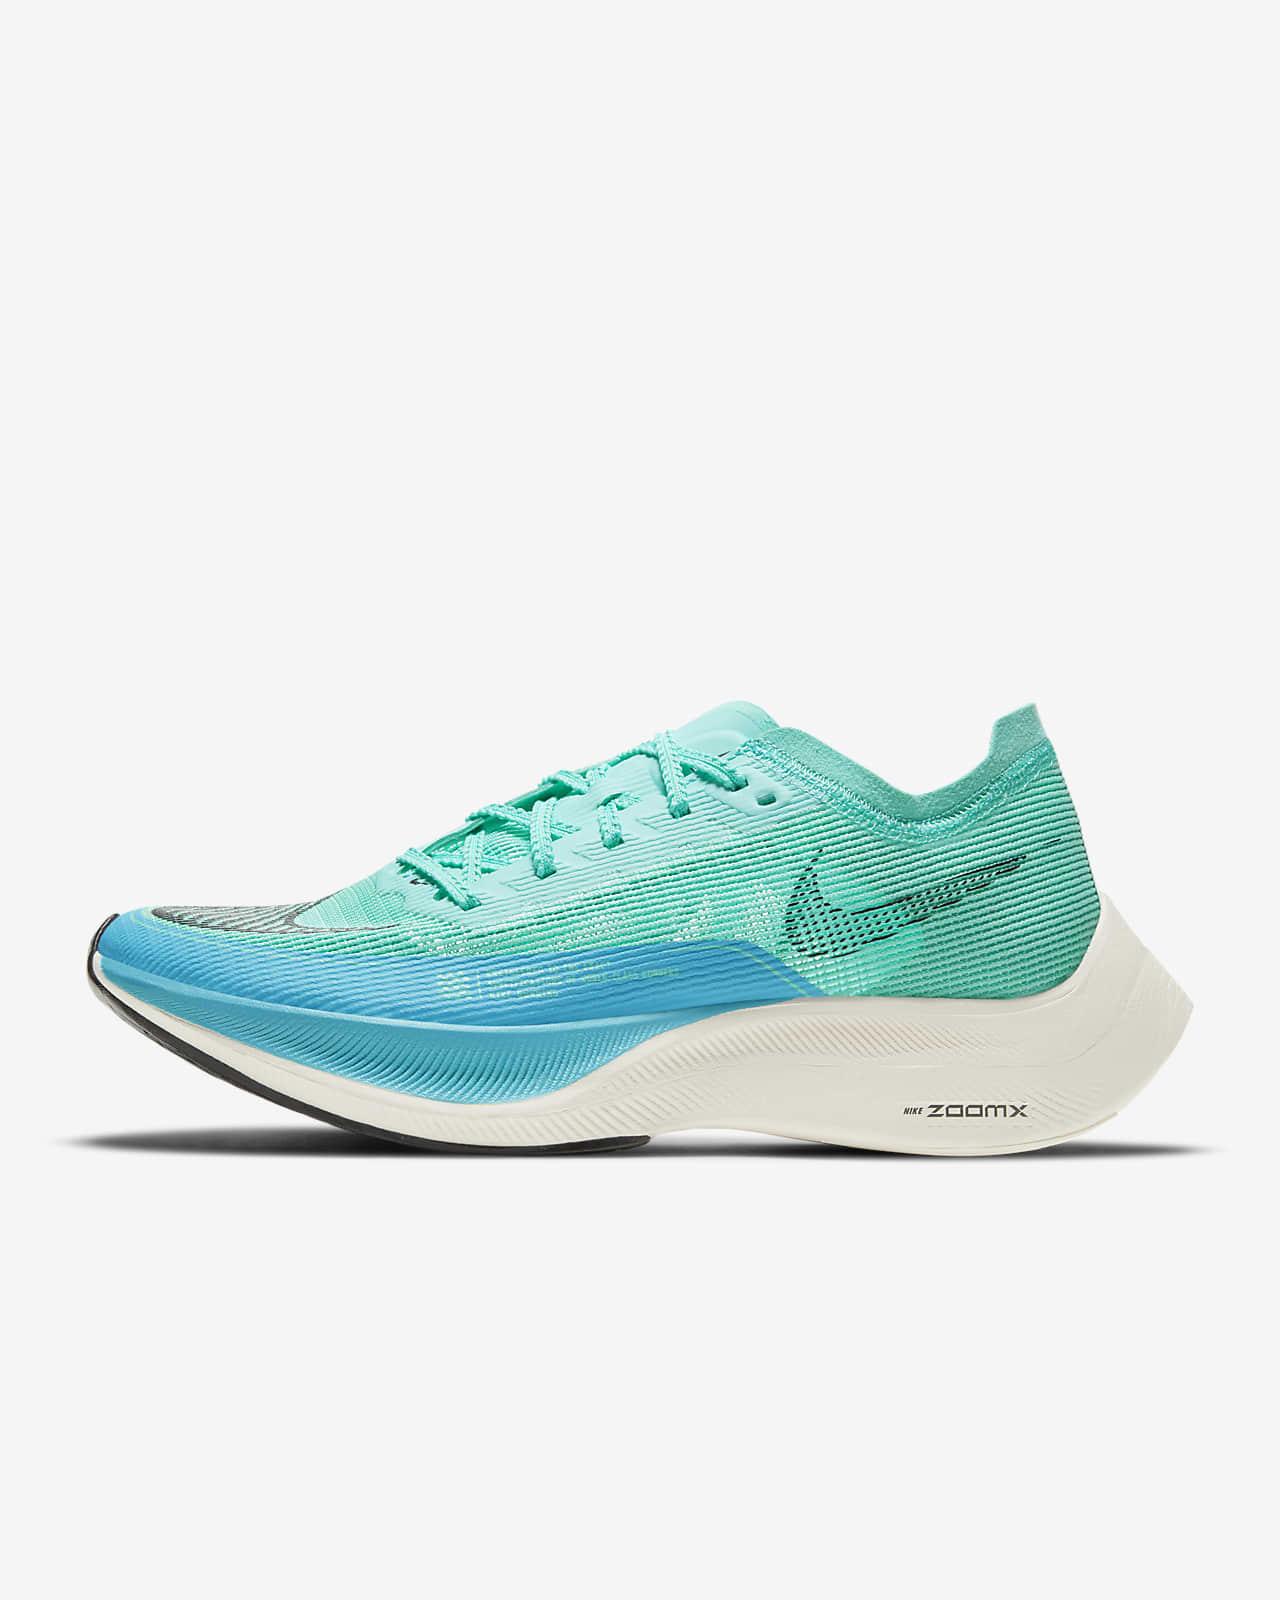 Nike ZoomX Vaporfly Next% 2 女子跑步鞋